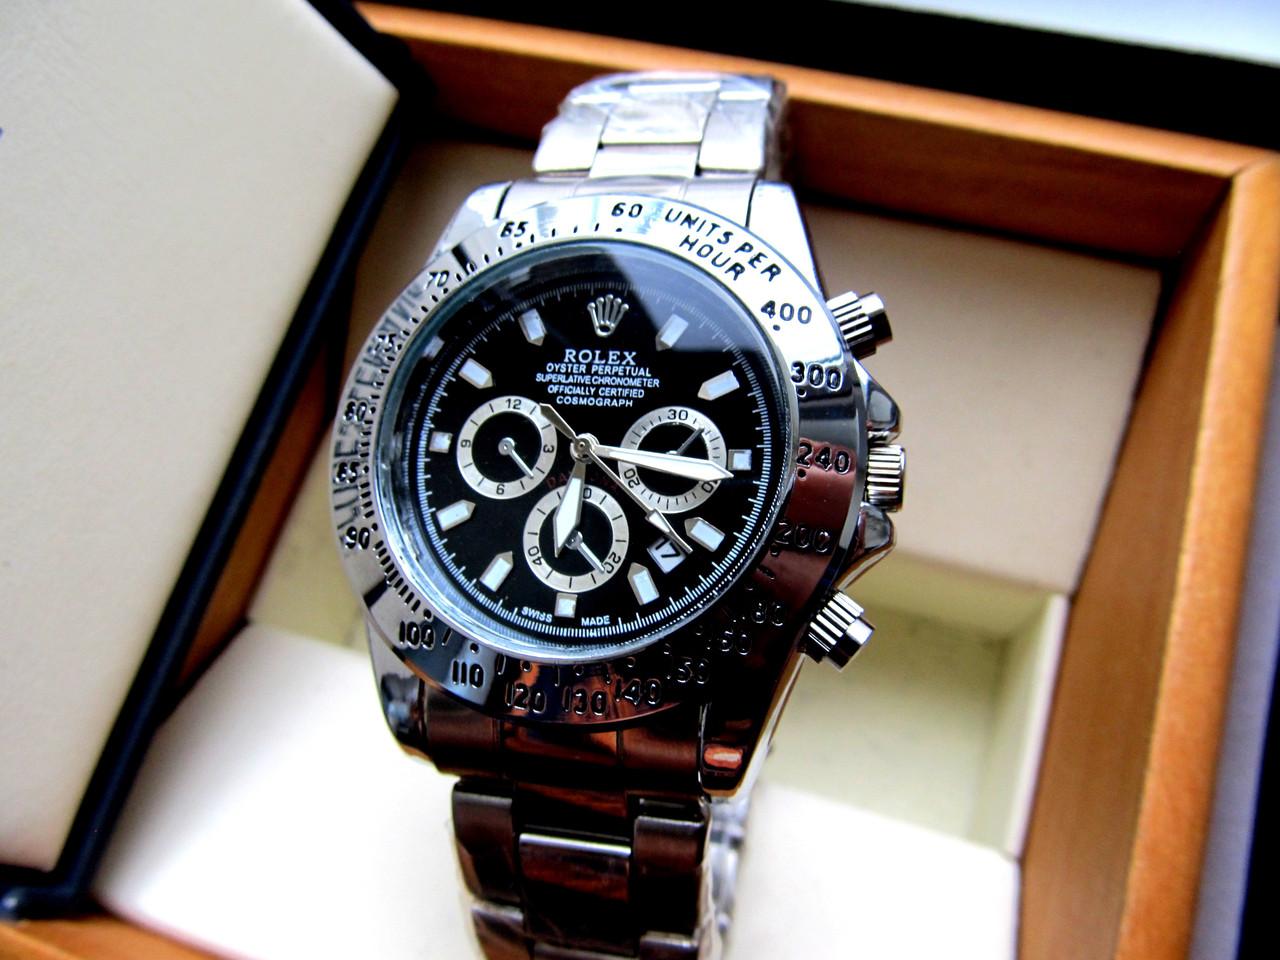 Наручные часы мужские rolex daytona часы наручные orient water resist